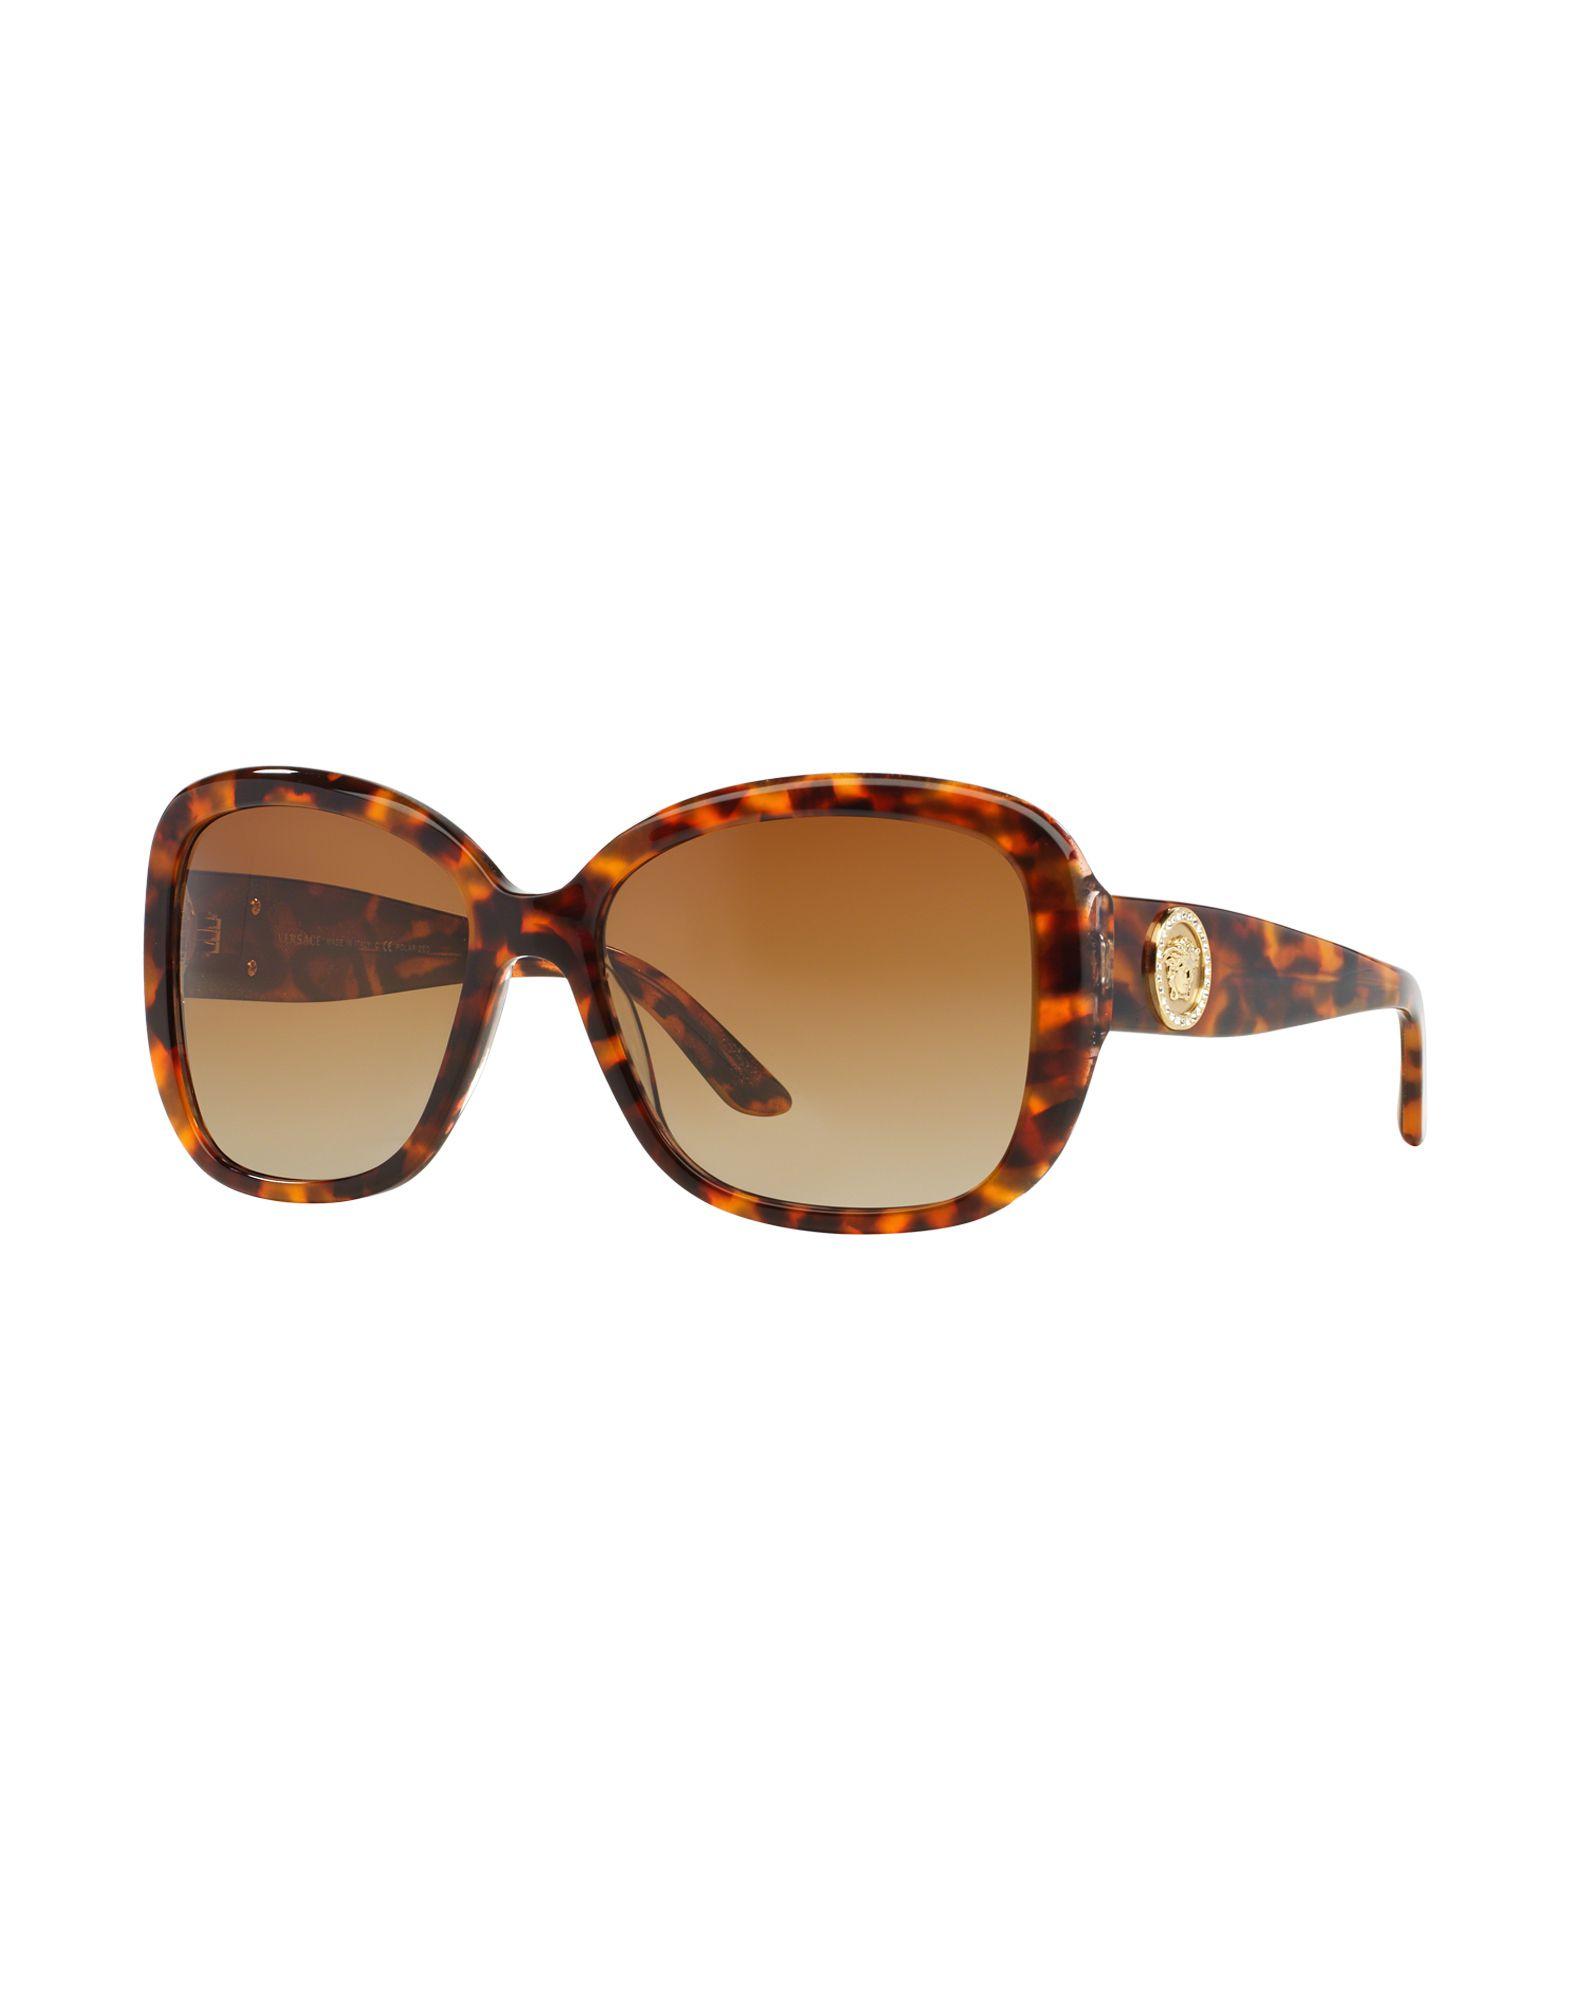 275f98a54c62 Smith Method Sunglasses Sale. Jun20. Elderly friends. Smith Method Sunglasses  Sale